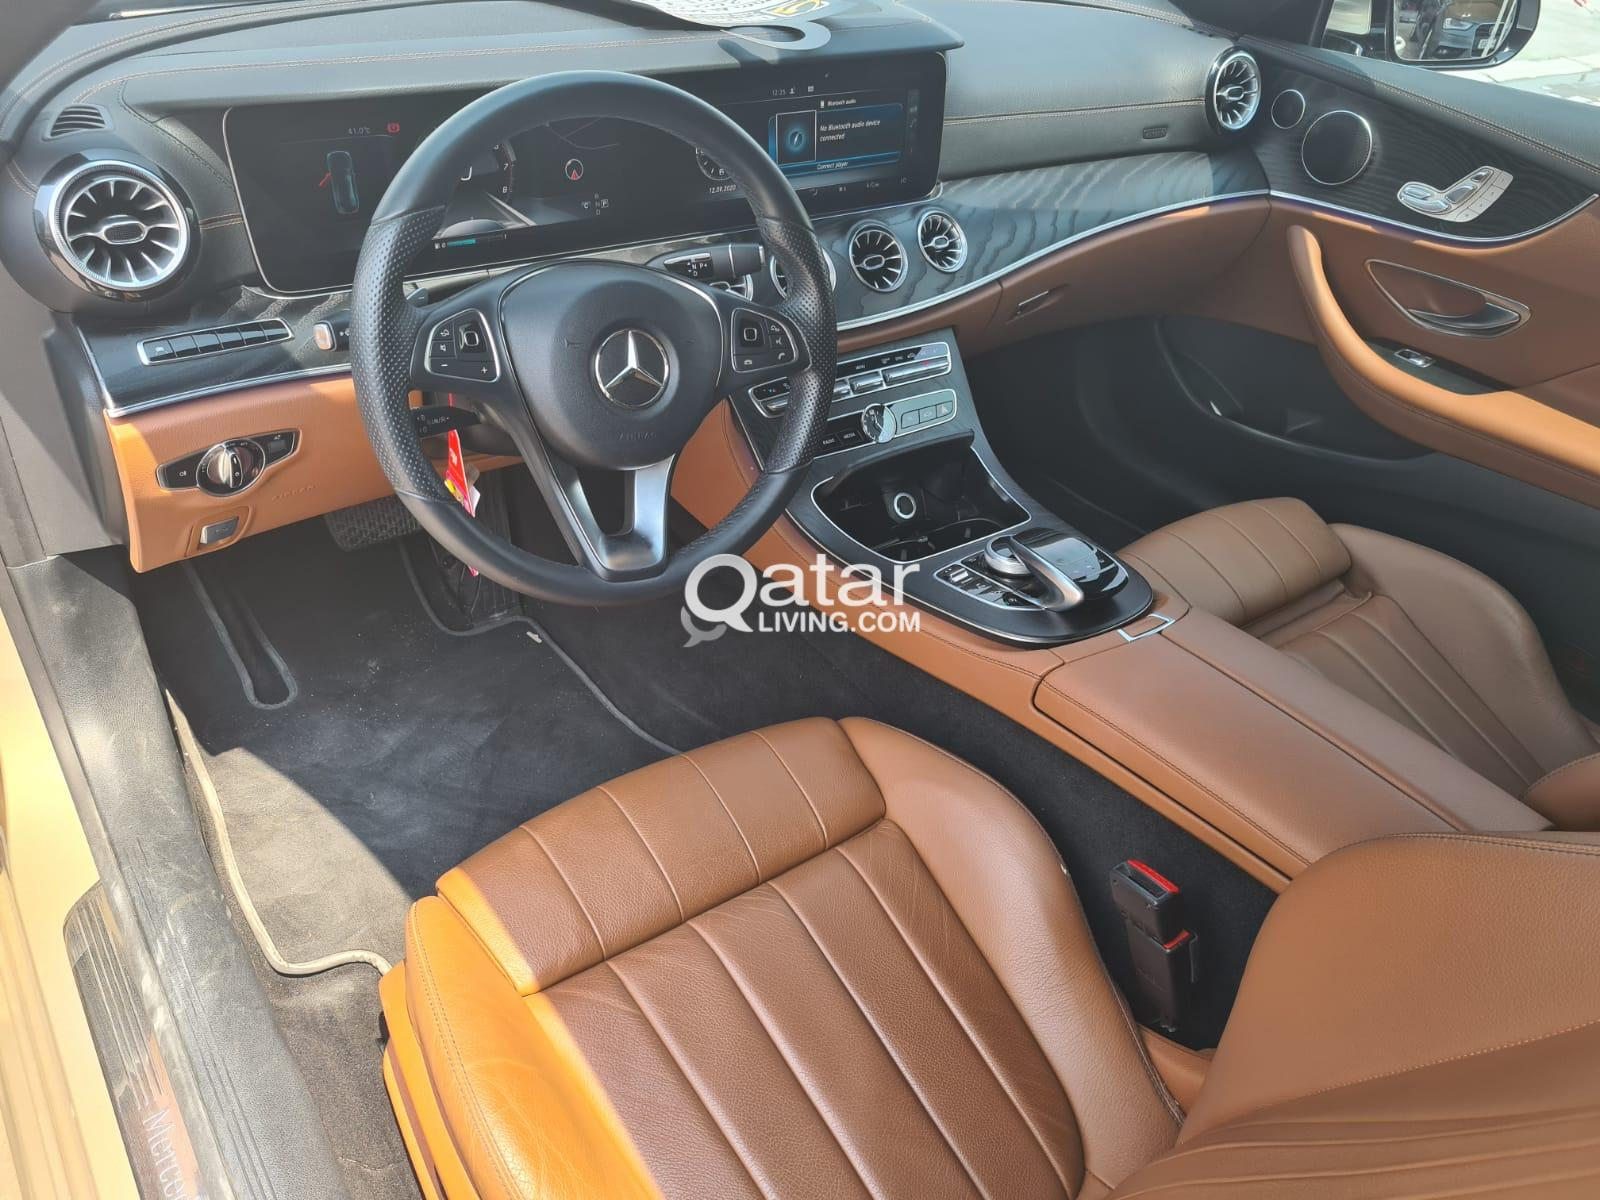 Mercedes E200 2017 Under Warranty